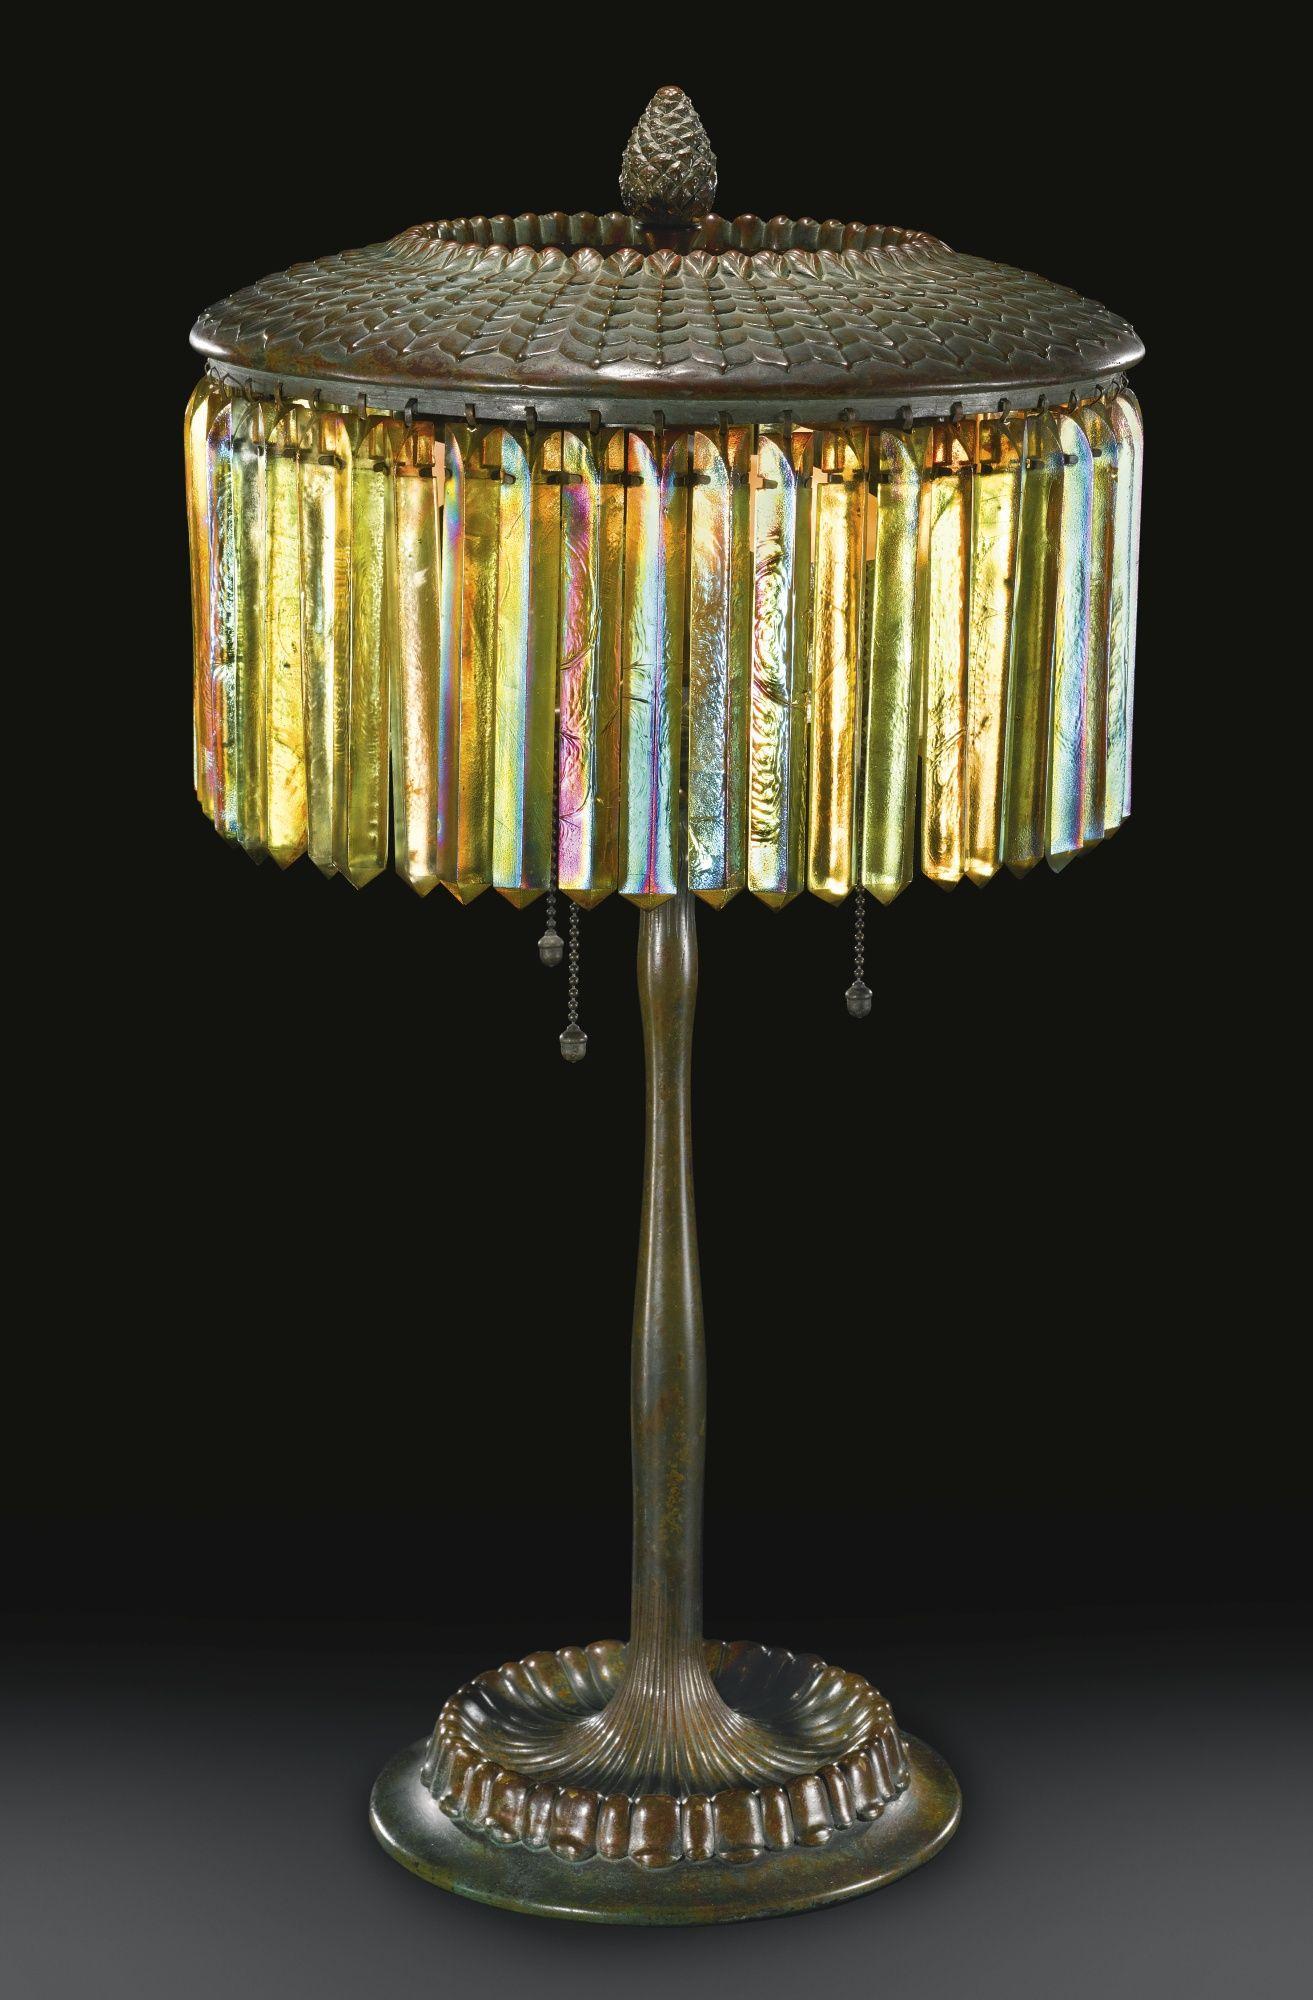 tiffany studios prism table lamp circa 1905 billy 39 s. Black Bedroom Furniture Sets. Home Design Ideas